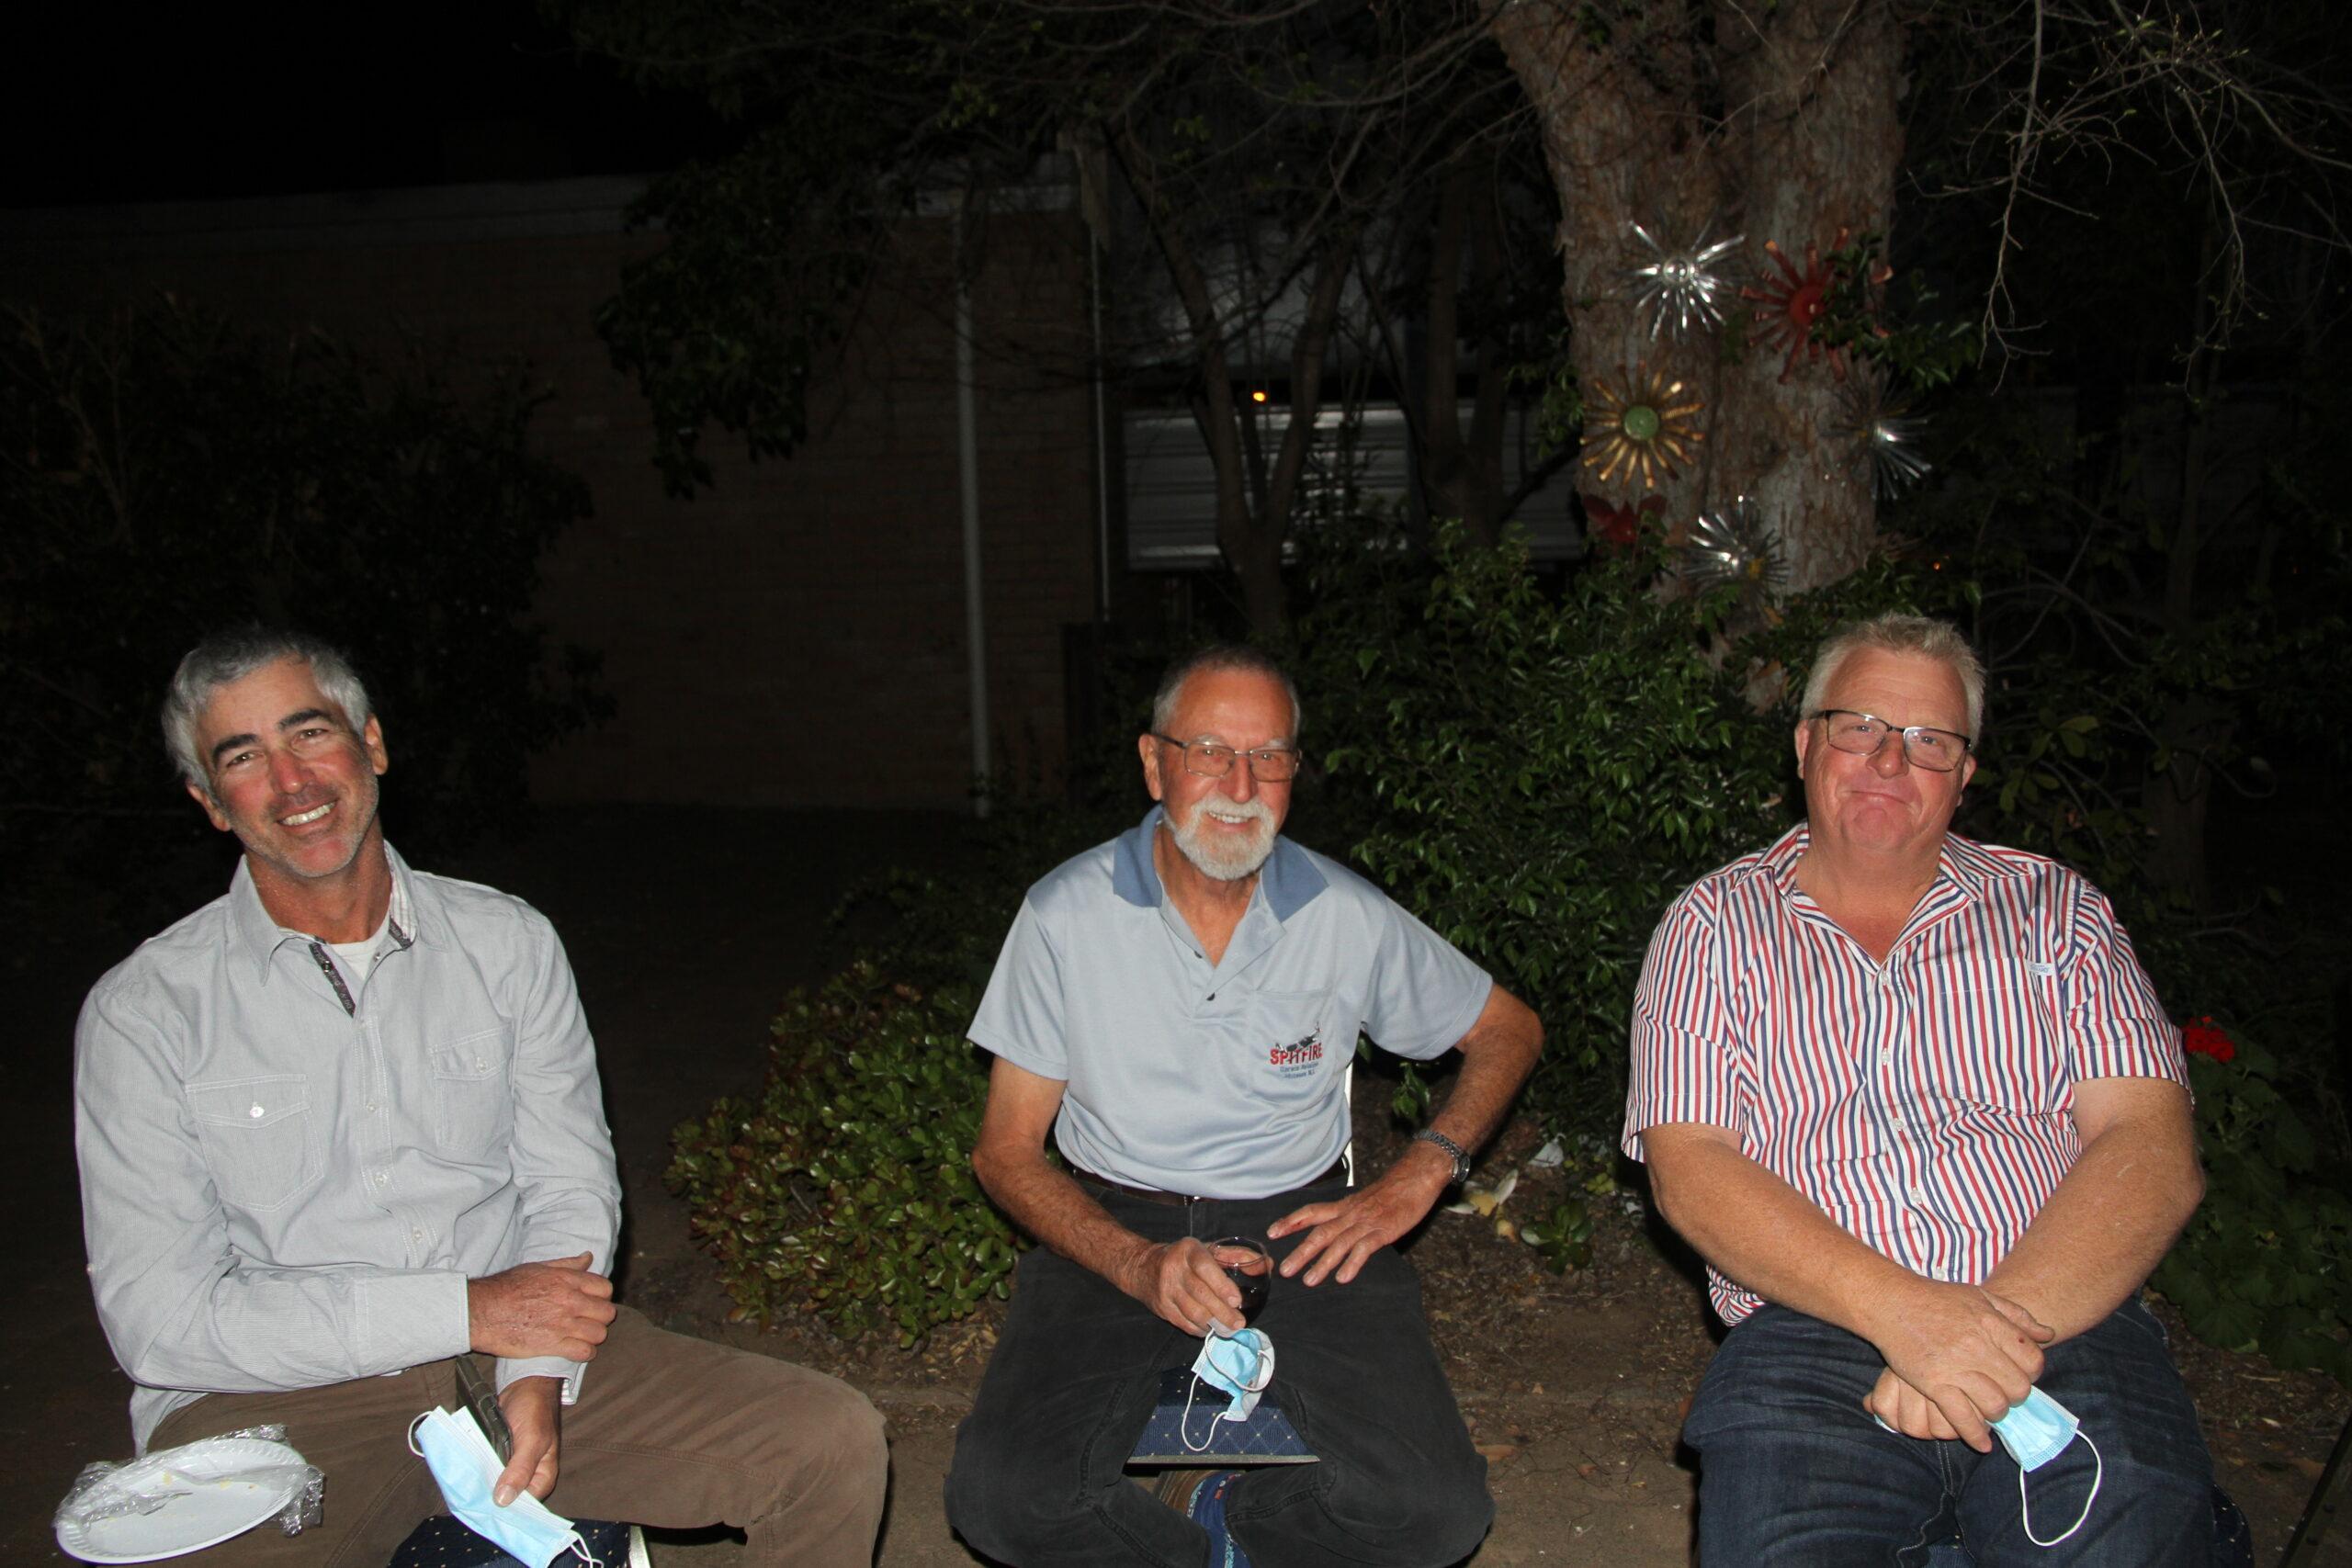 Nimrod Mor, Ken Nobilo and Wayne Pym.